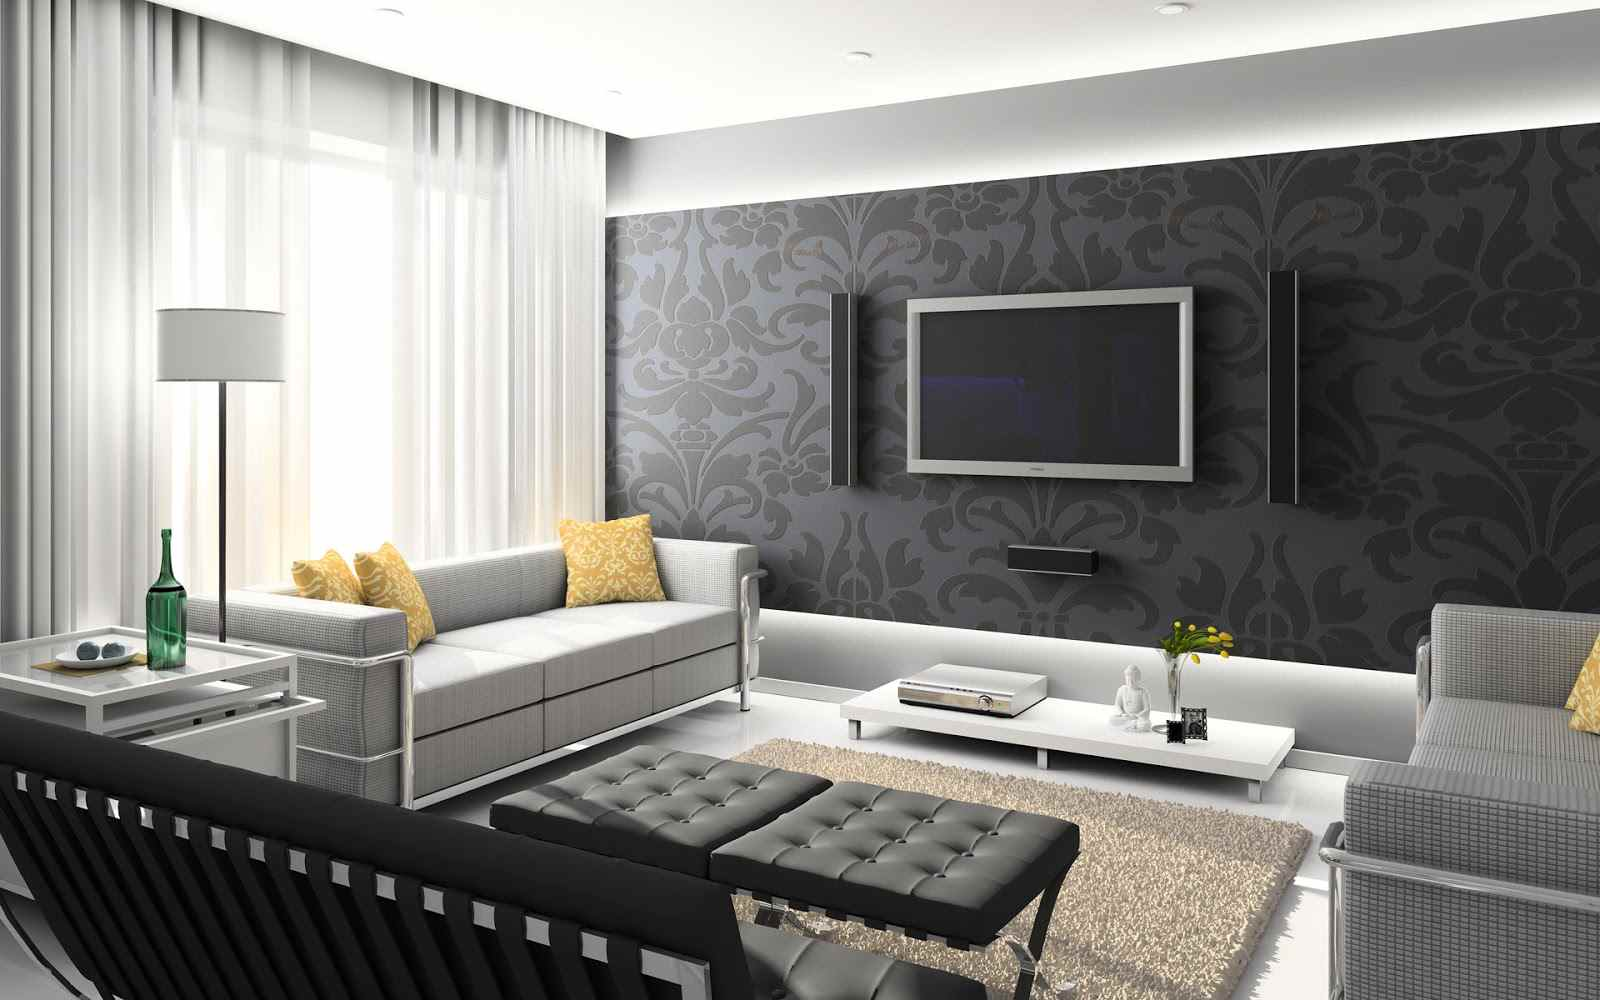 Home Wallpaper Pattern wallpaper for your home - wallpapersafari